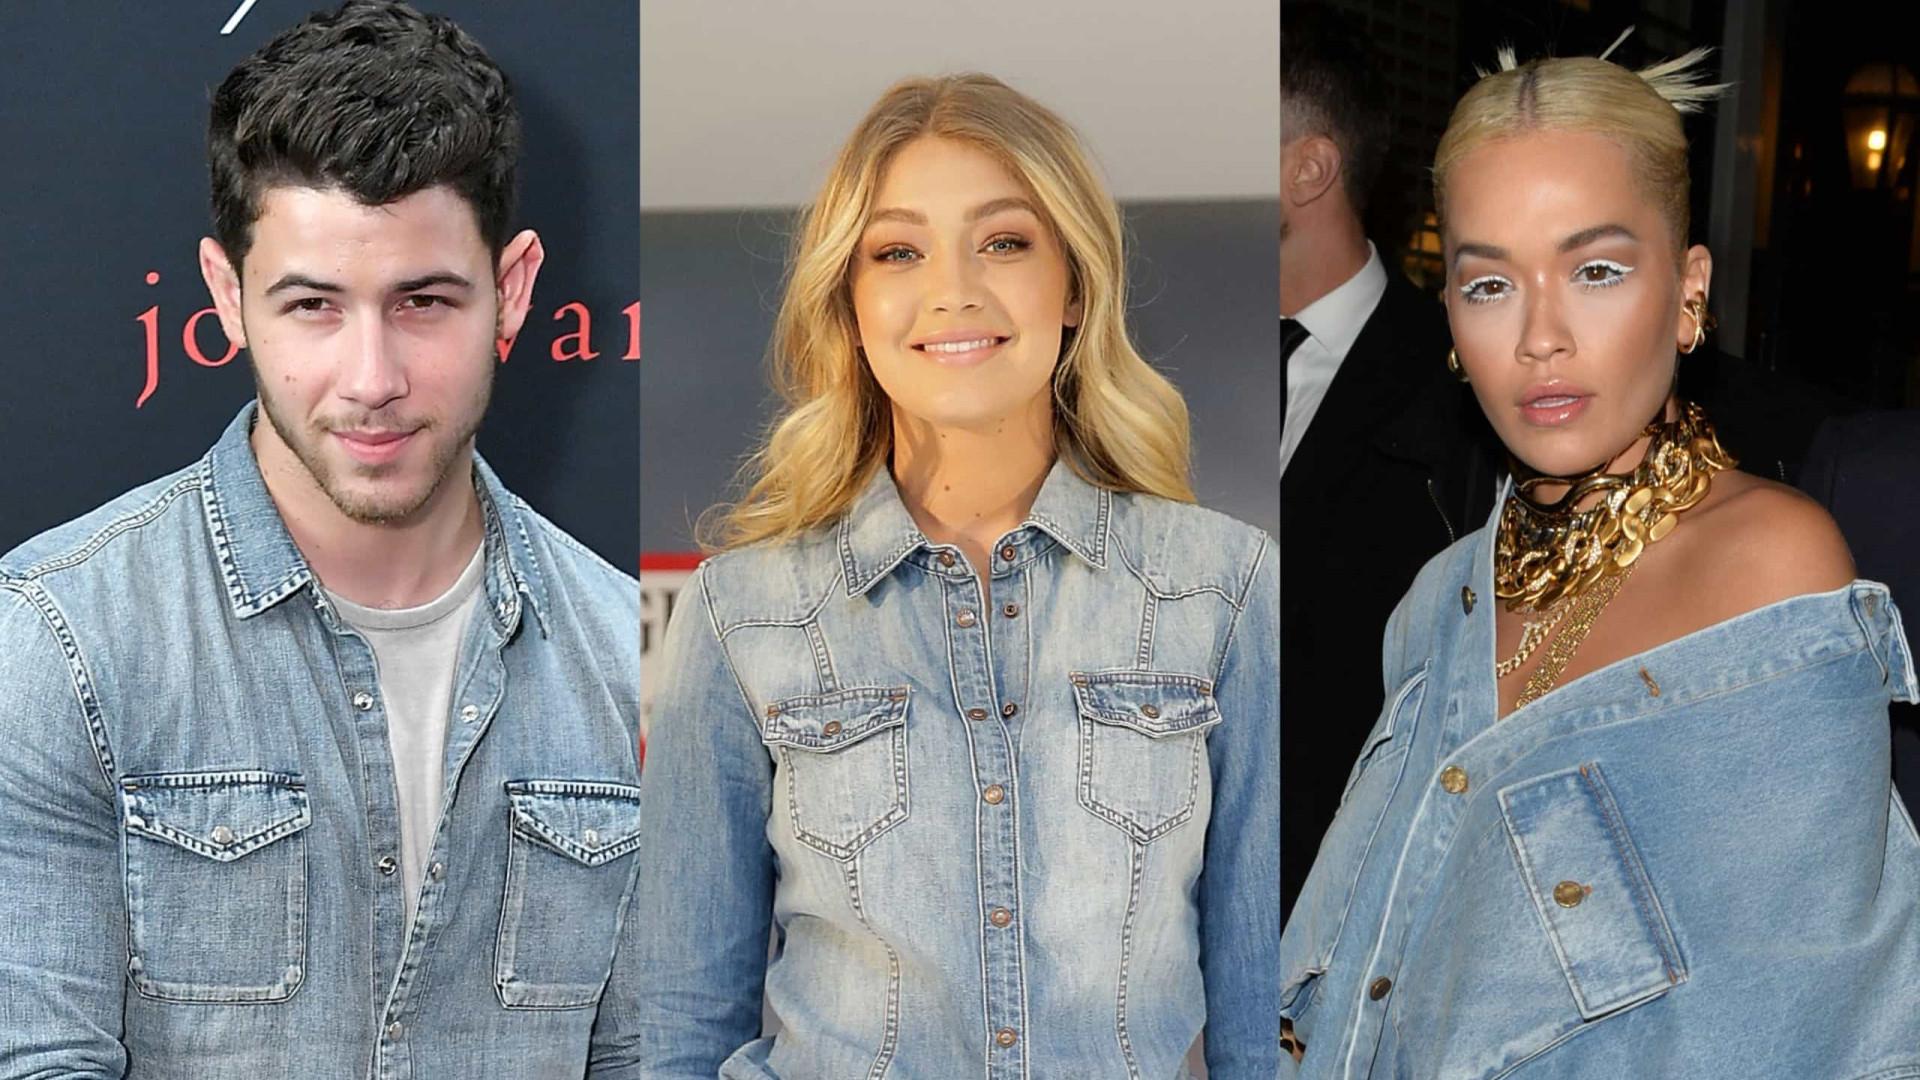 Os looks dos famosos no estilo total jeans